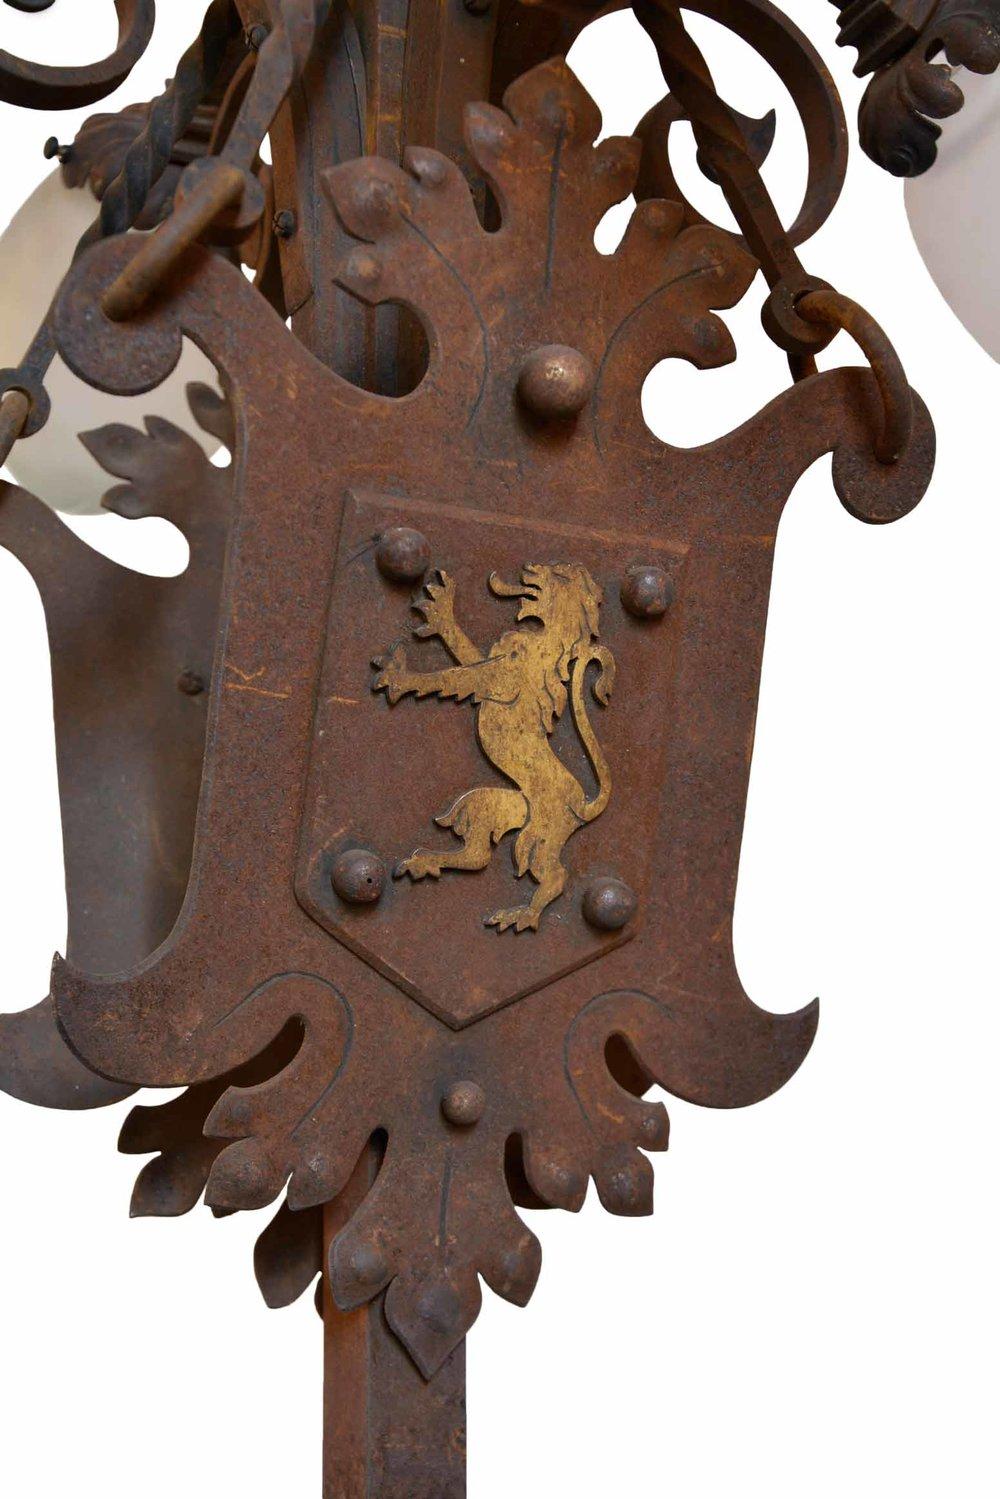 45968-iron-4-arm-chandelier-with-griffon-crest-detail-lion.jpg